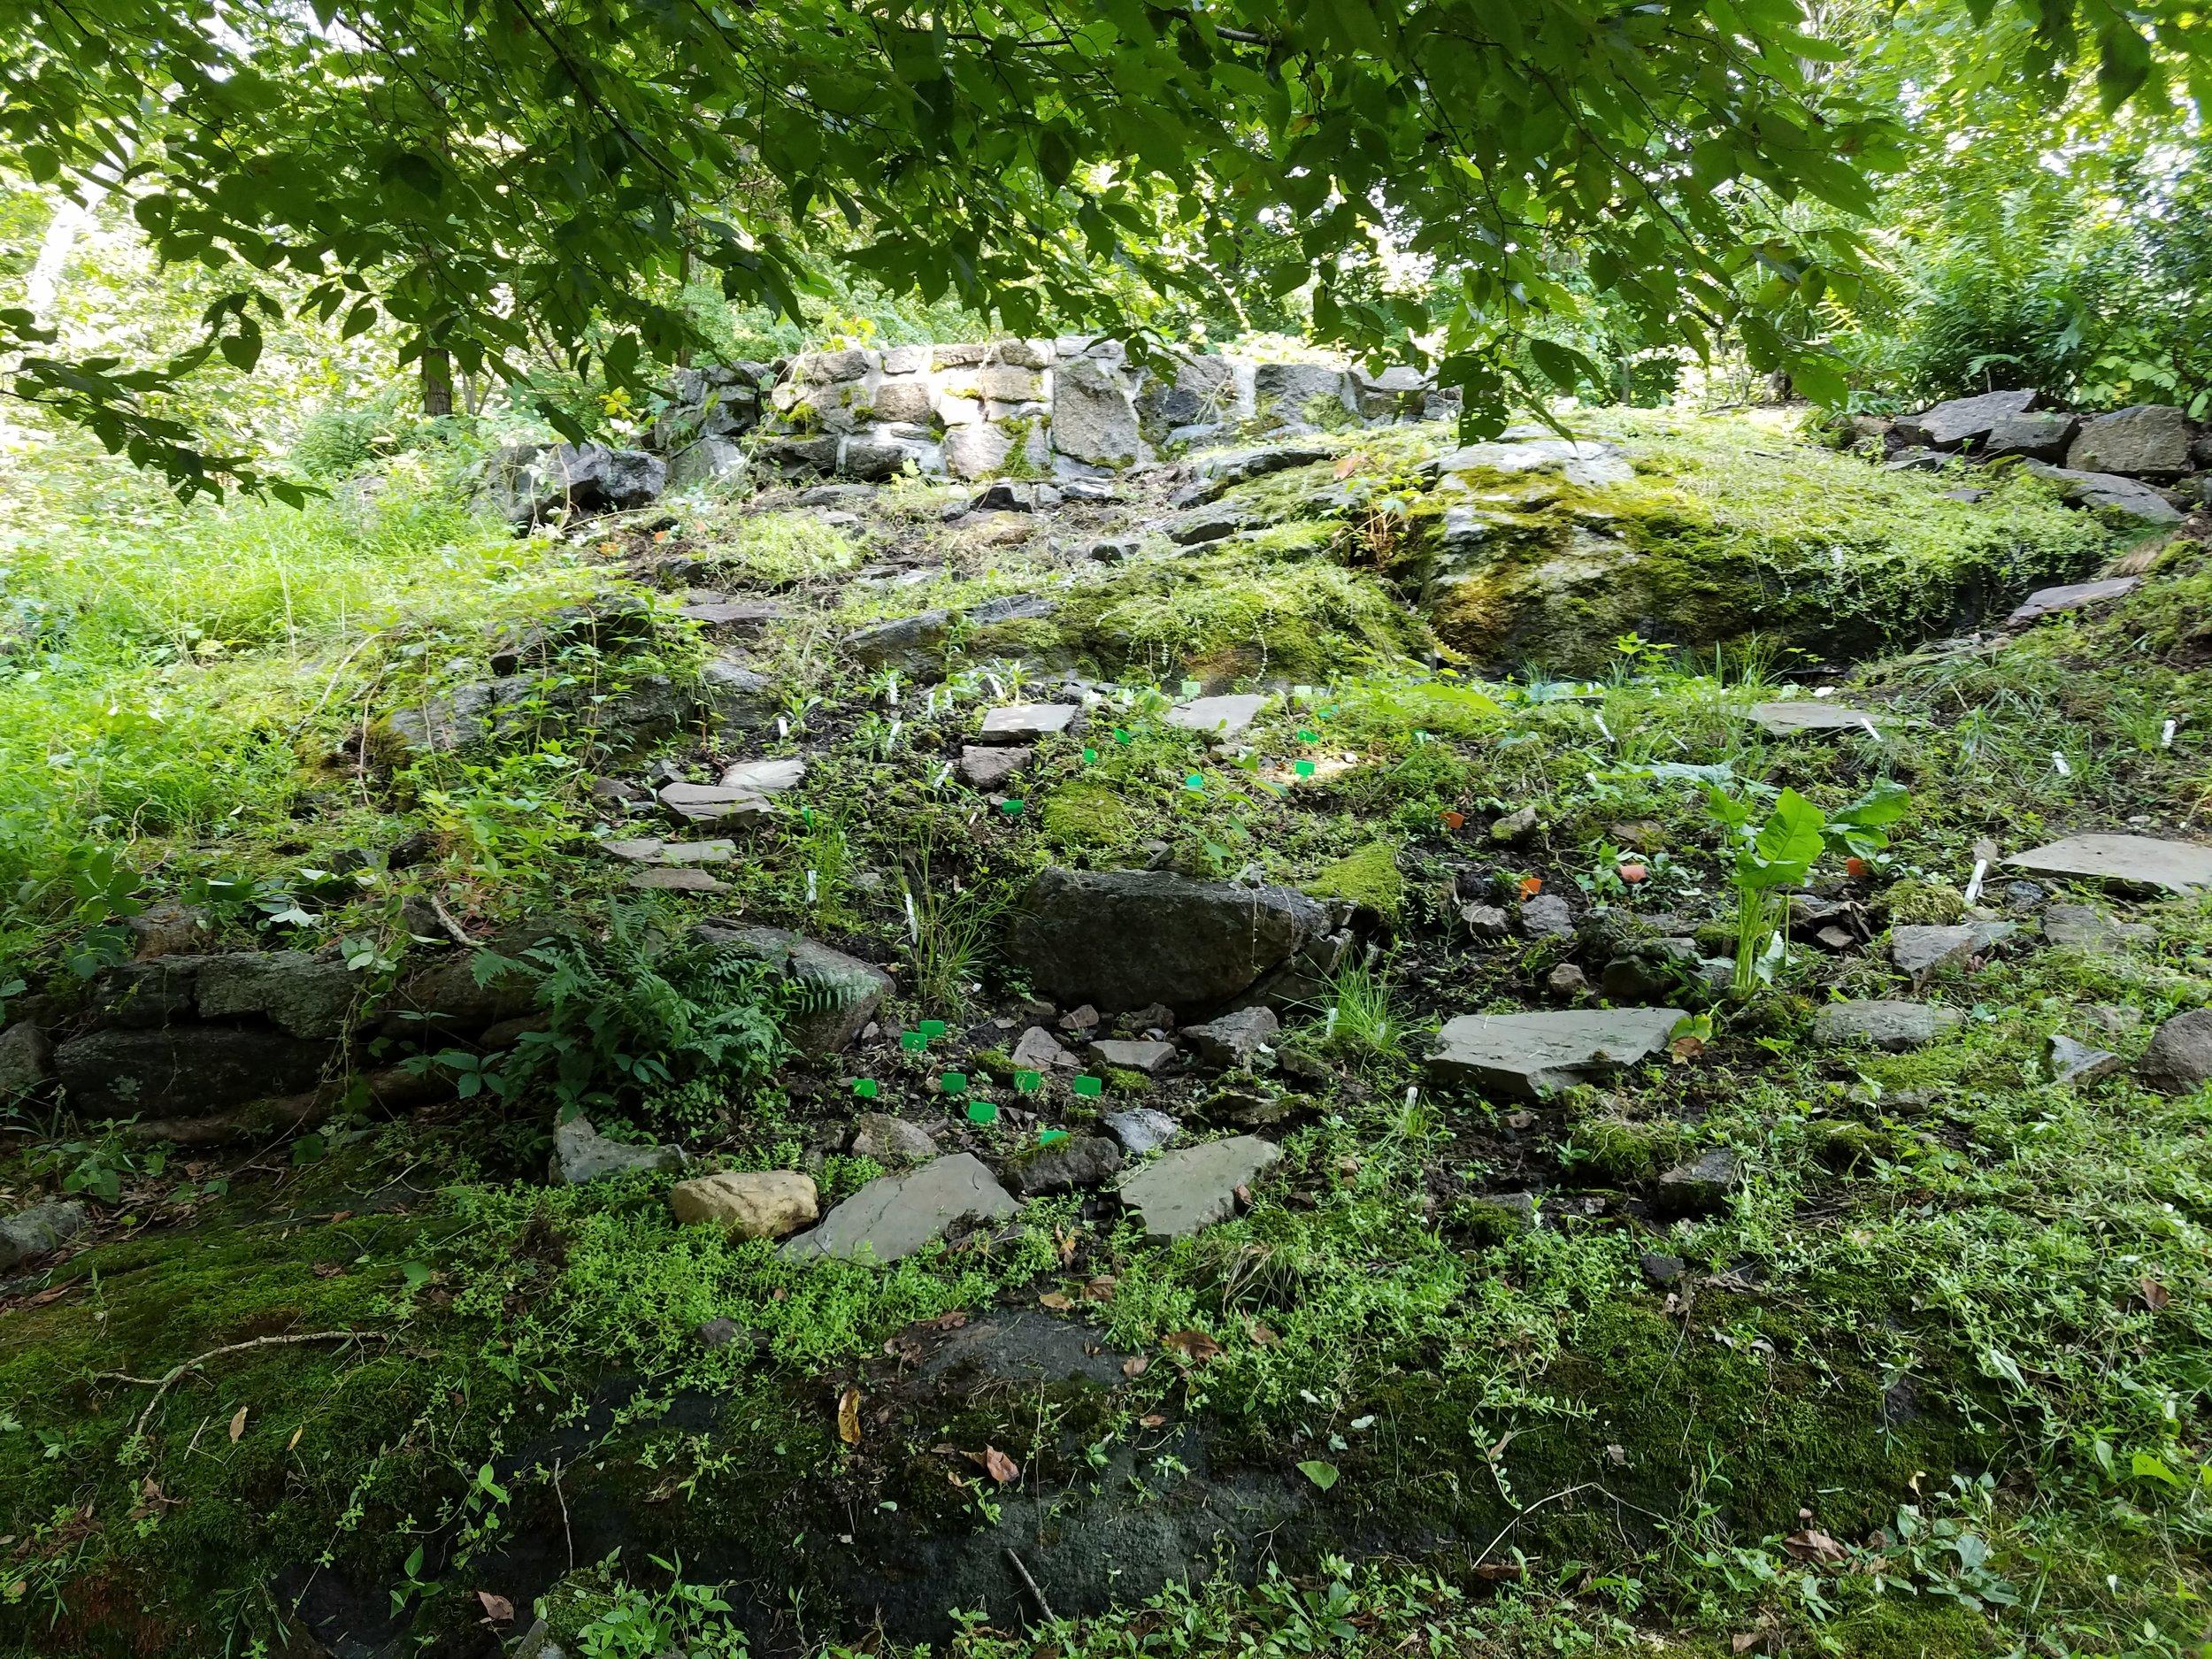 Native Rock Garden in Cortlandt